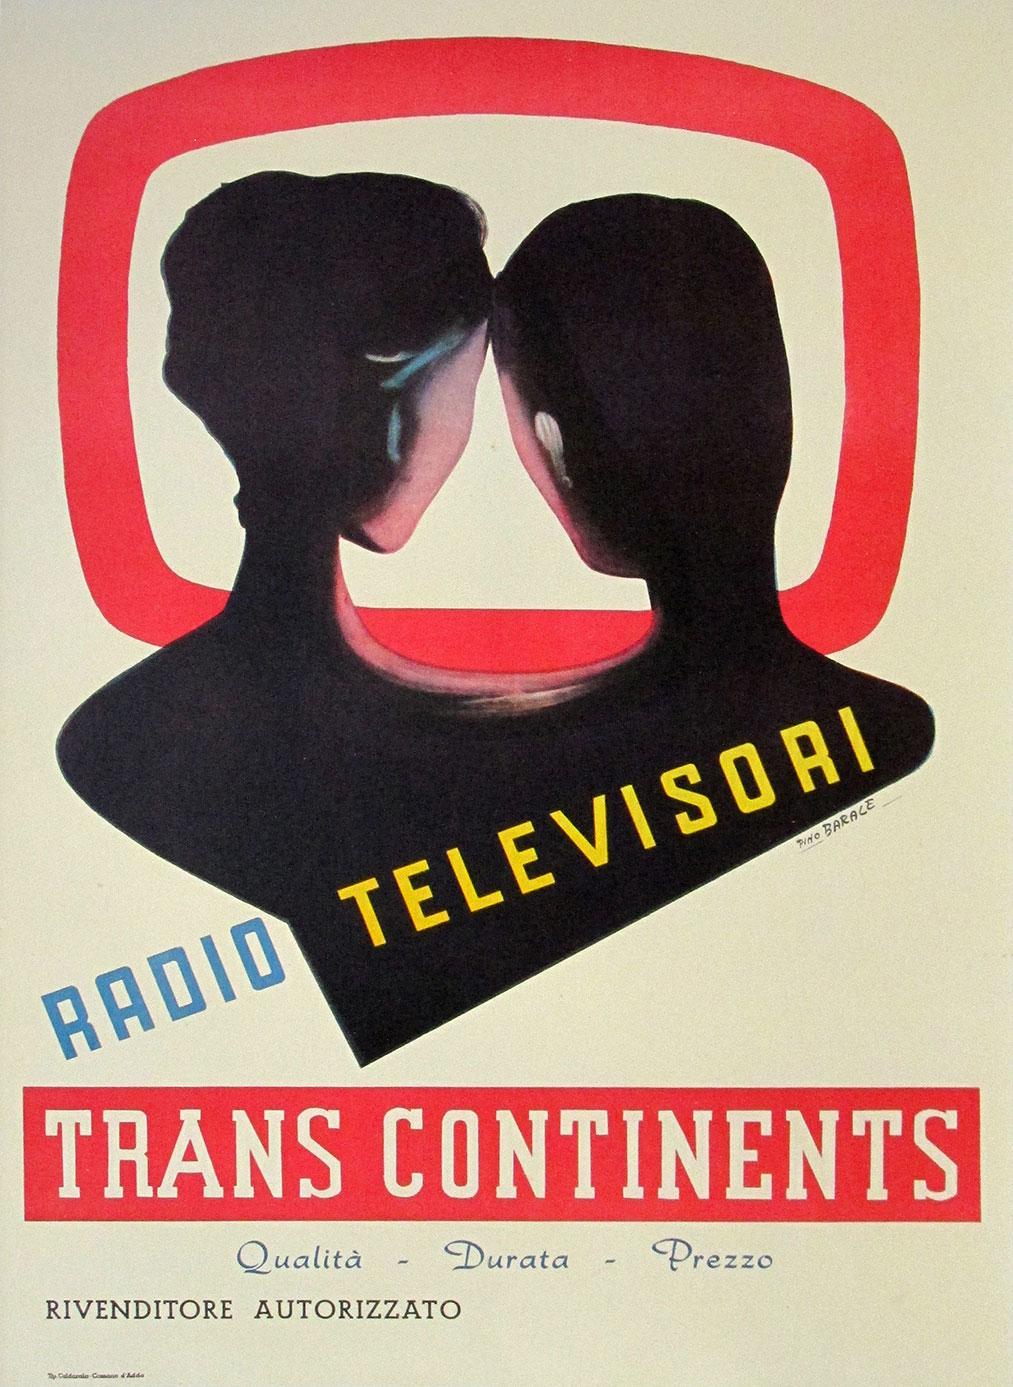 Image of Radio Televisori Trans Continents - WG00010